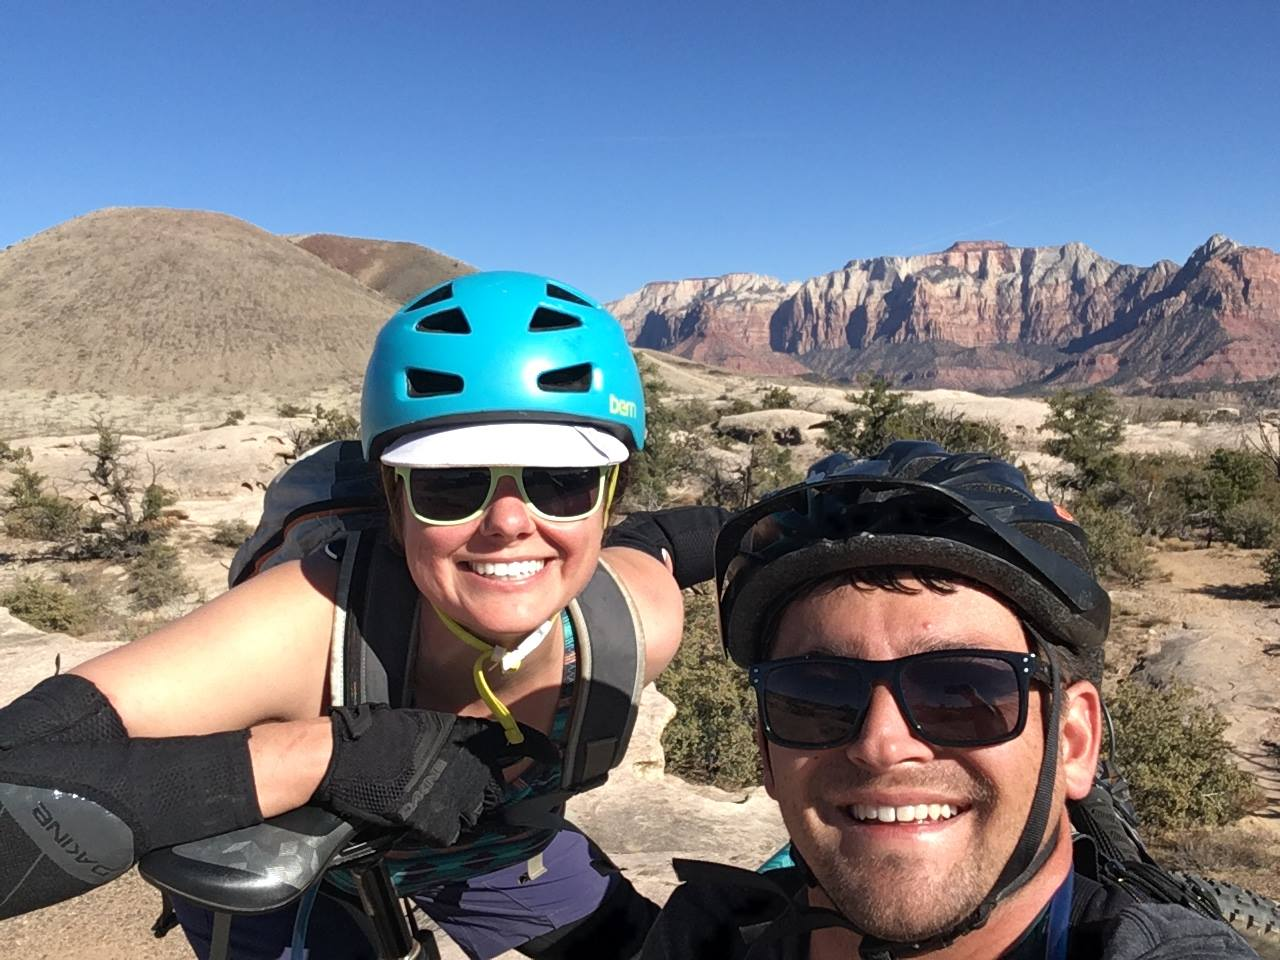 Zion National Park, MTB trip, Mountain biking